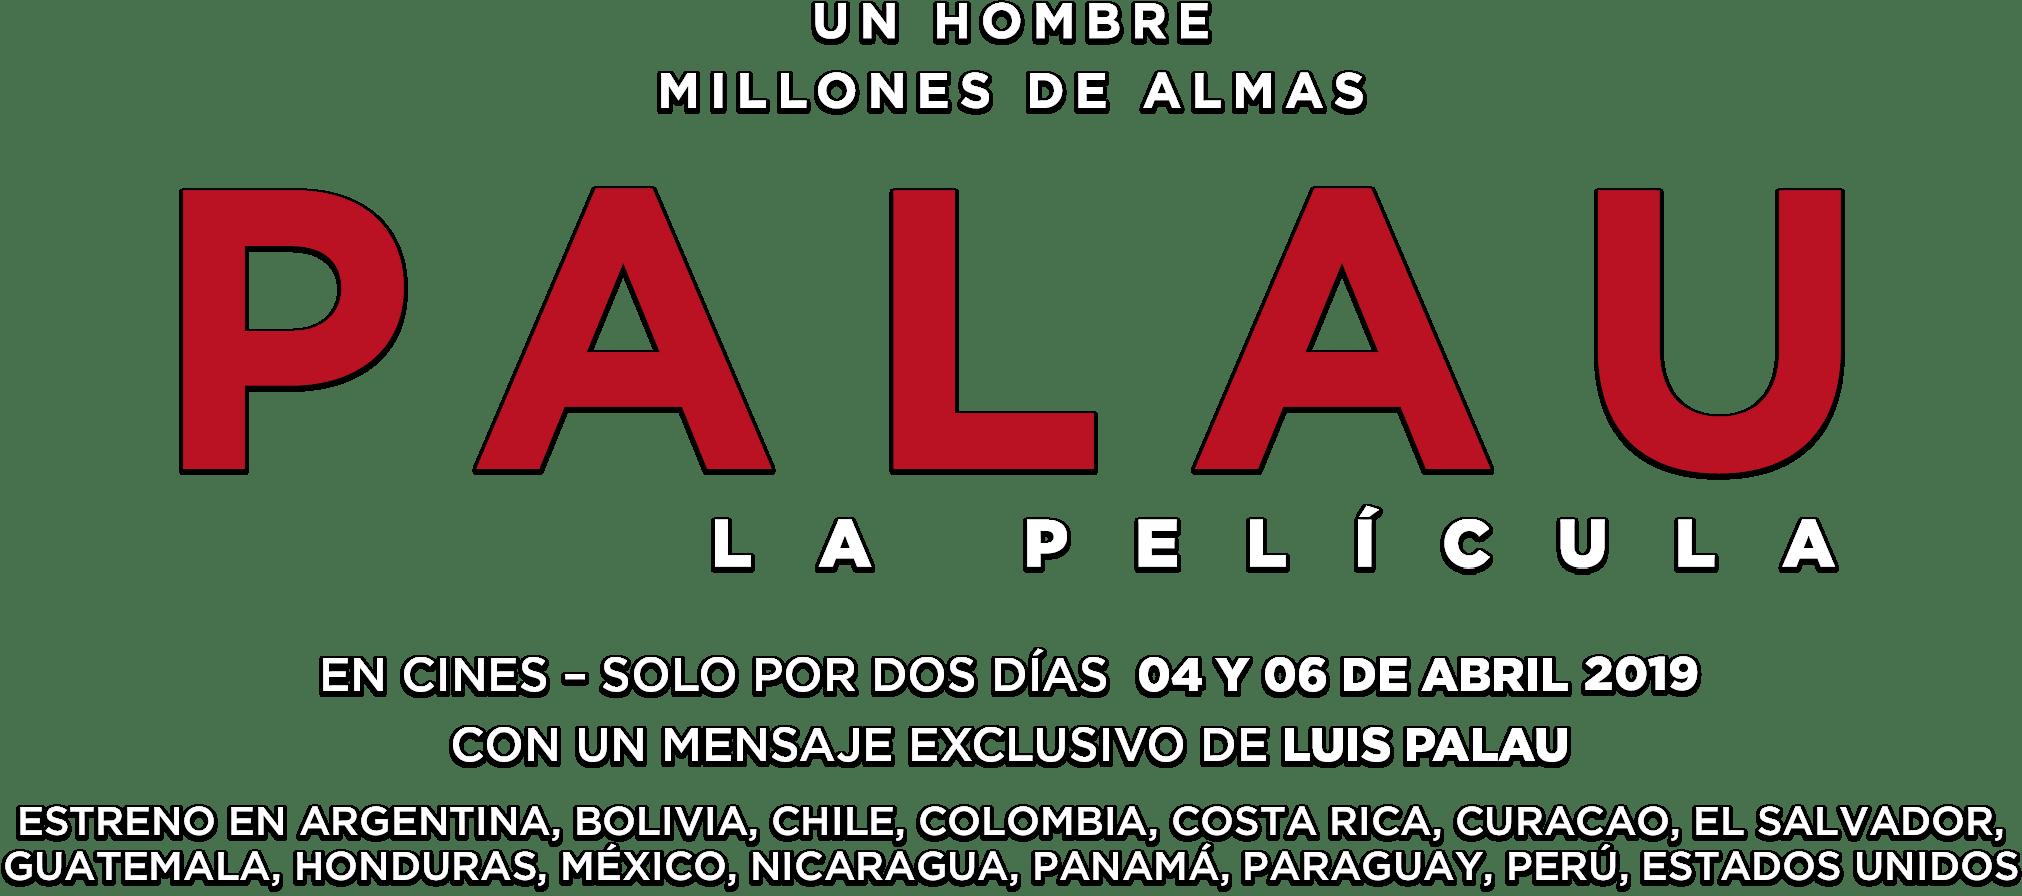 PALAU La Película: Sinopsis | Trafalgar Releasing